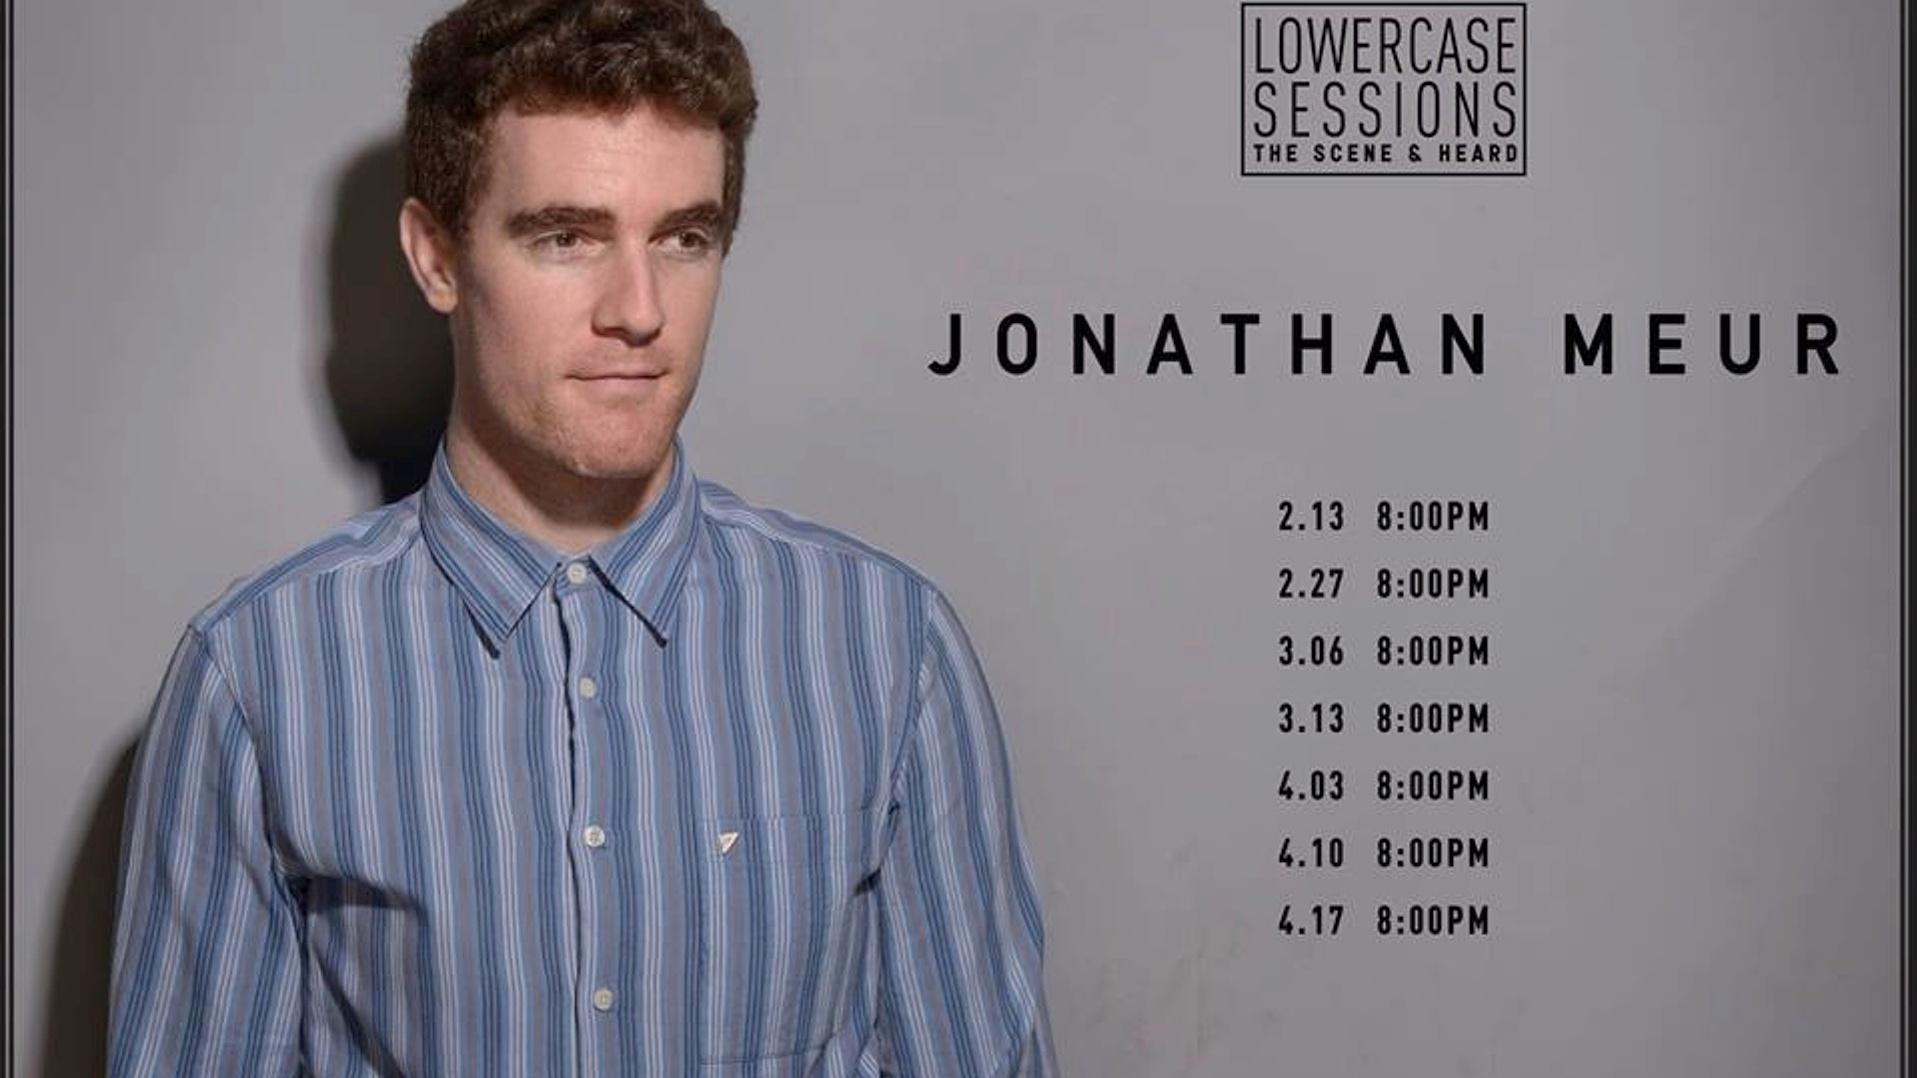 Lowercase Sessions: Jonathan Meur